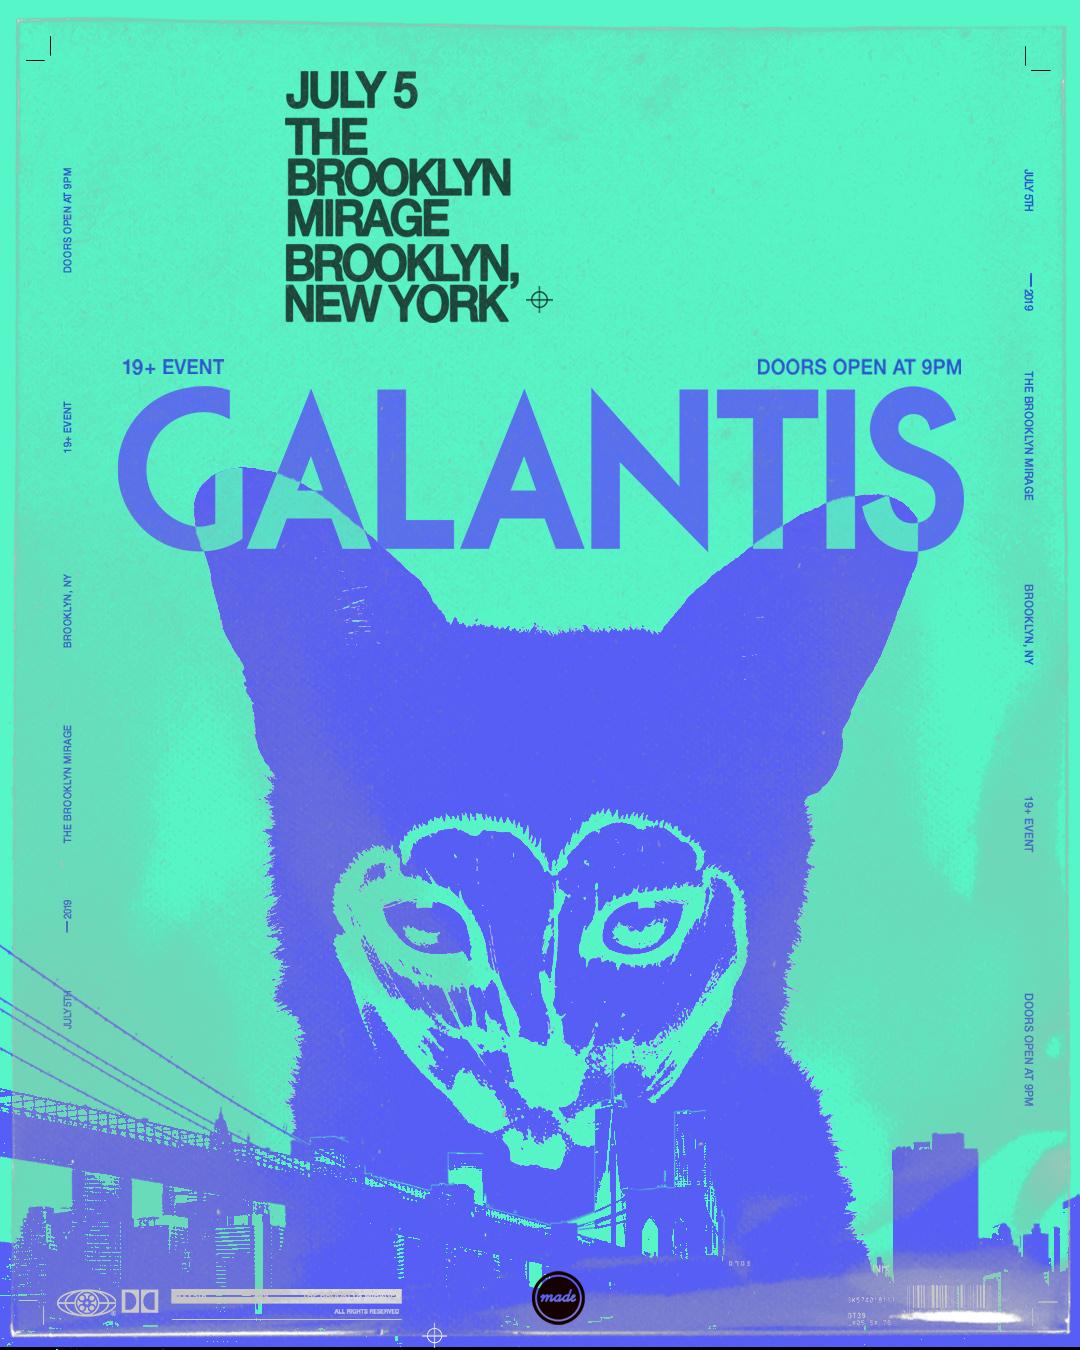 Presale Codes for GALANTIS BROOKLYN MIRAGE